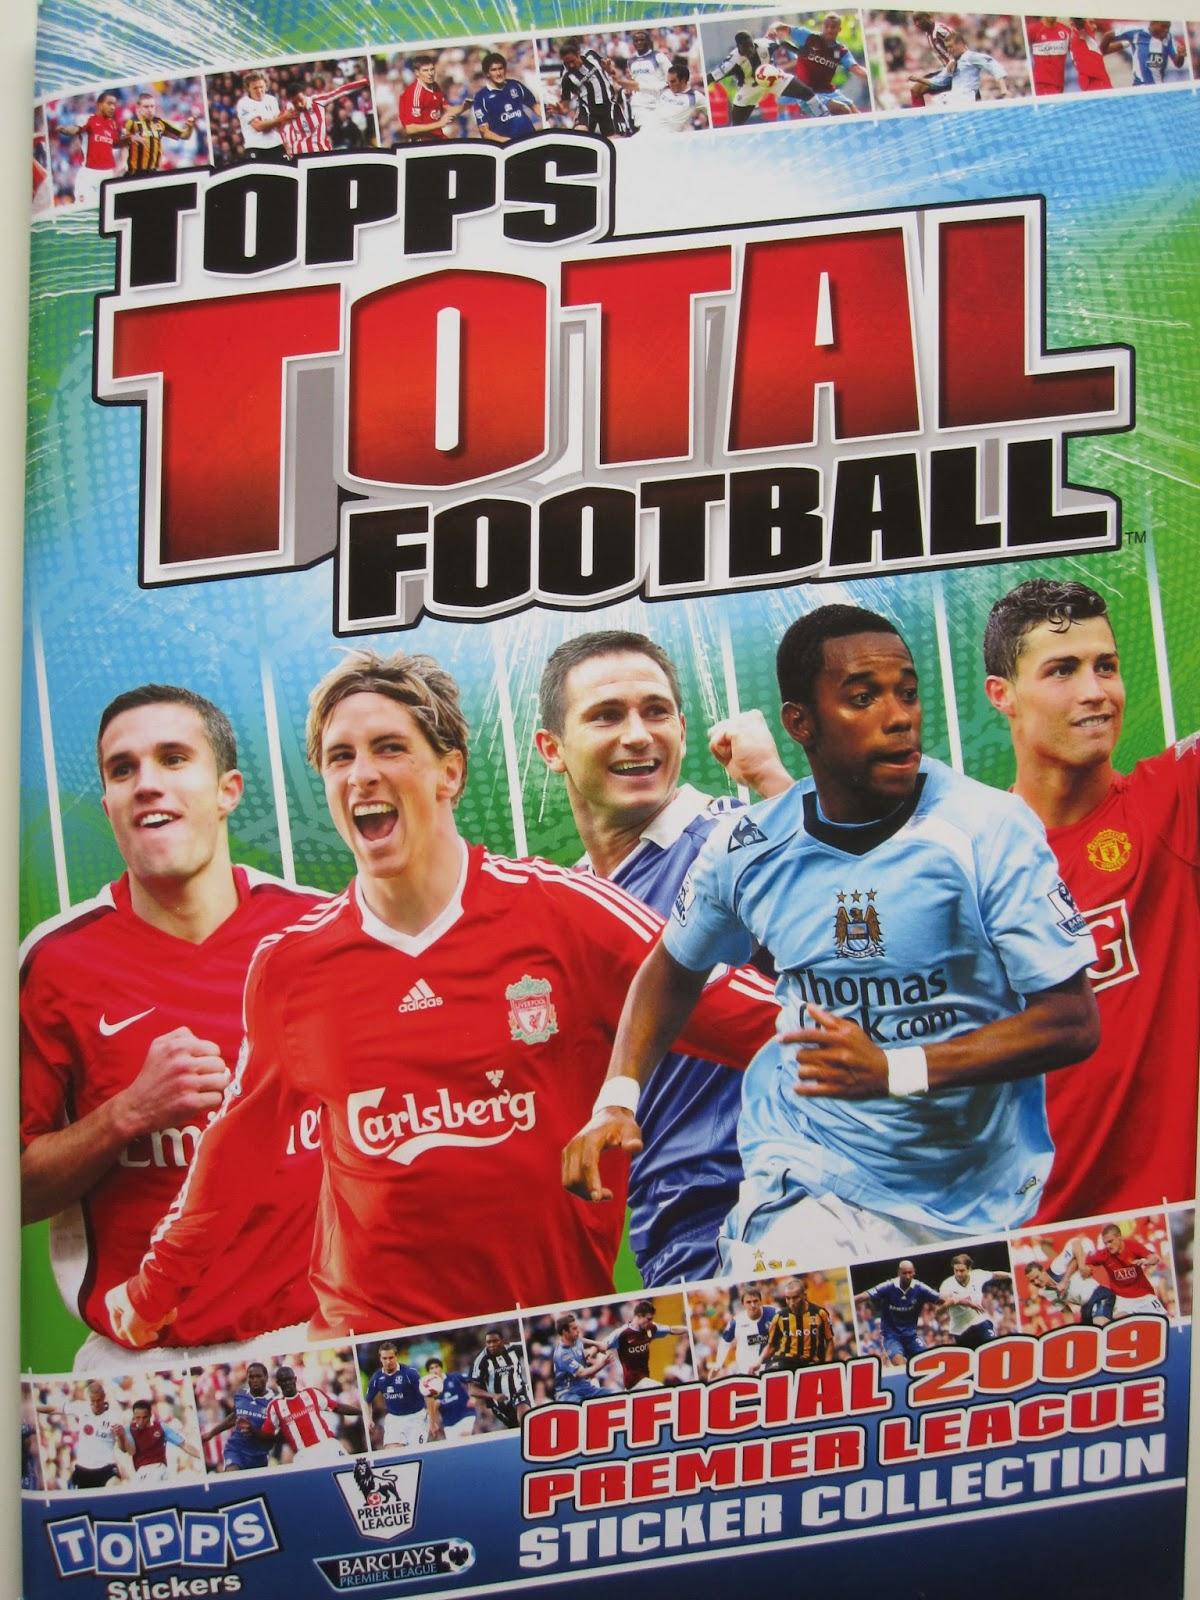 #040-ASTON VILLA-CHELSEA-READING-STEVE SIDWELL TOPPS TOTAL FOOTBALL-2009